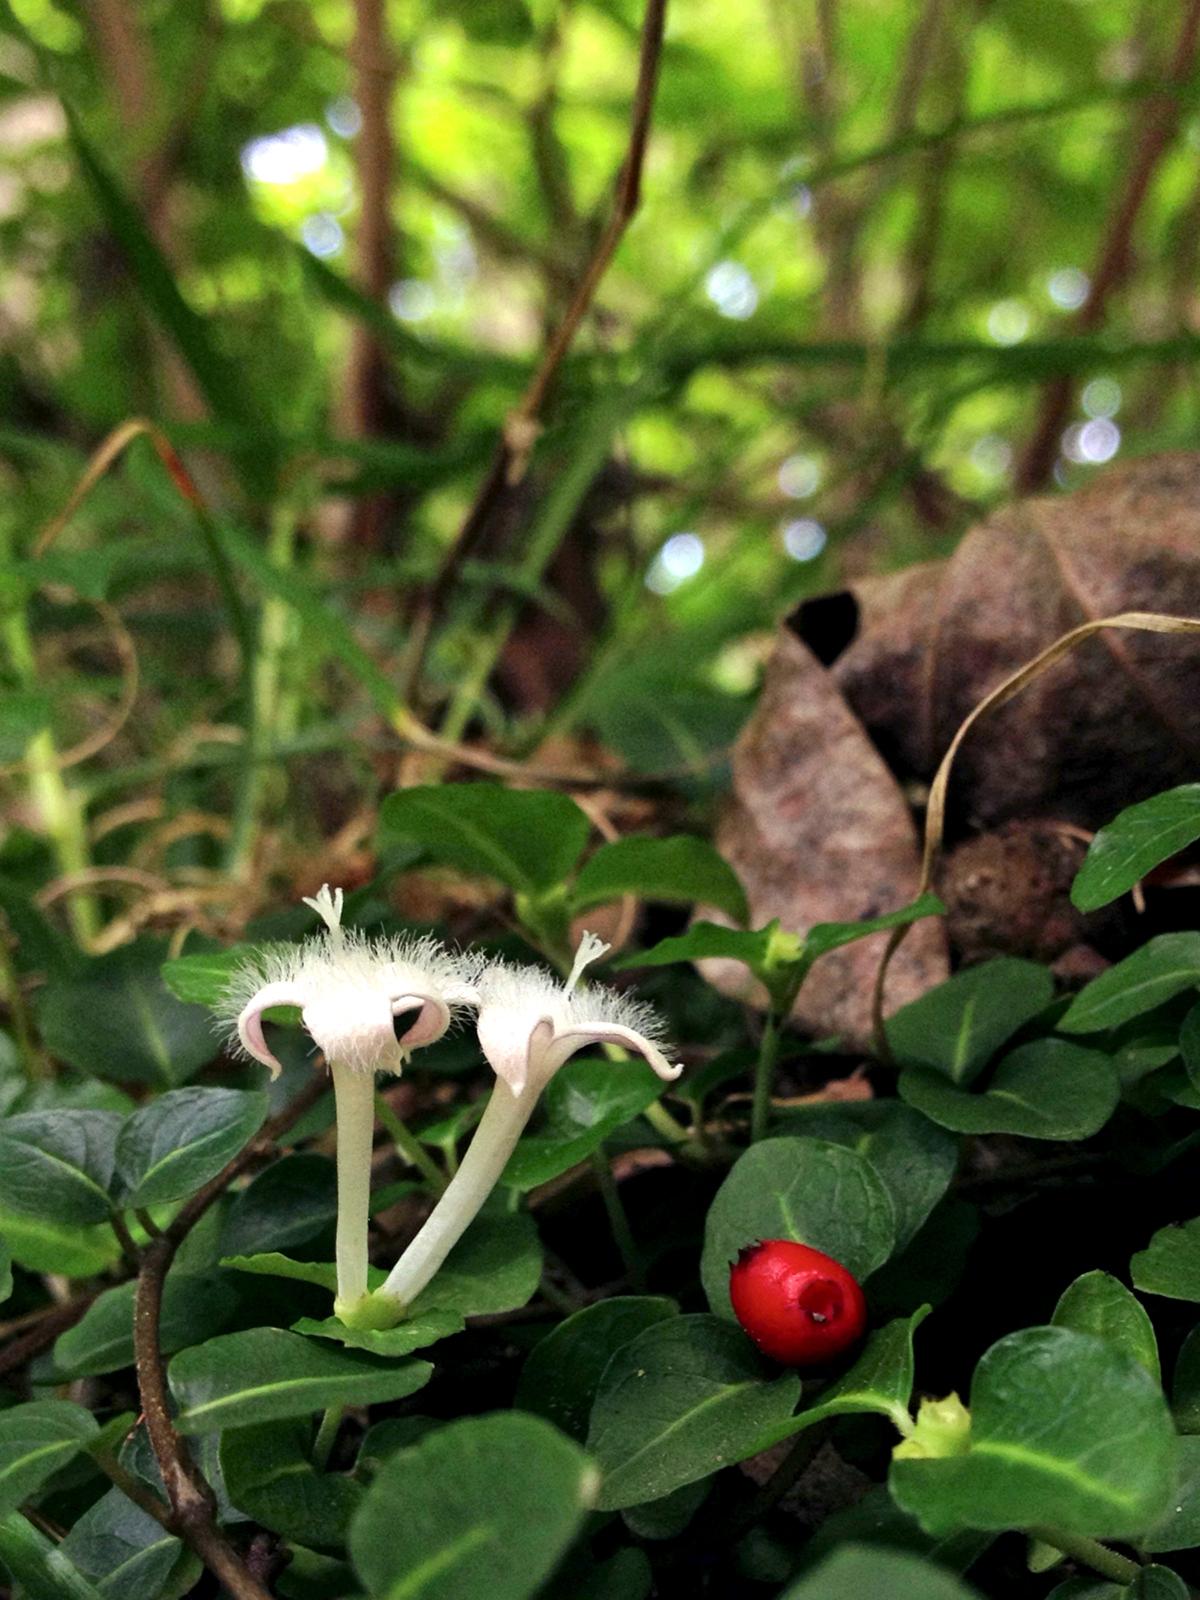 Native Plant Profile: Partridge Berry